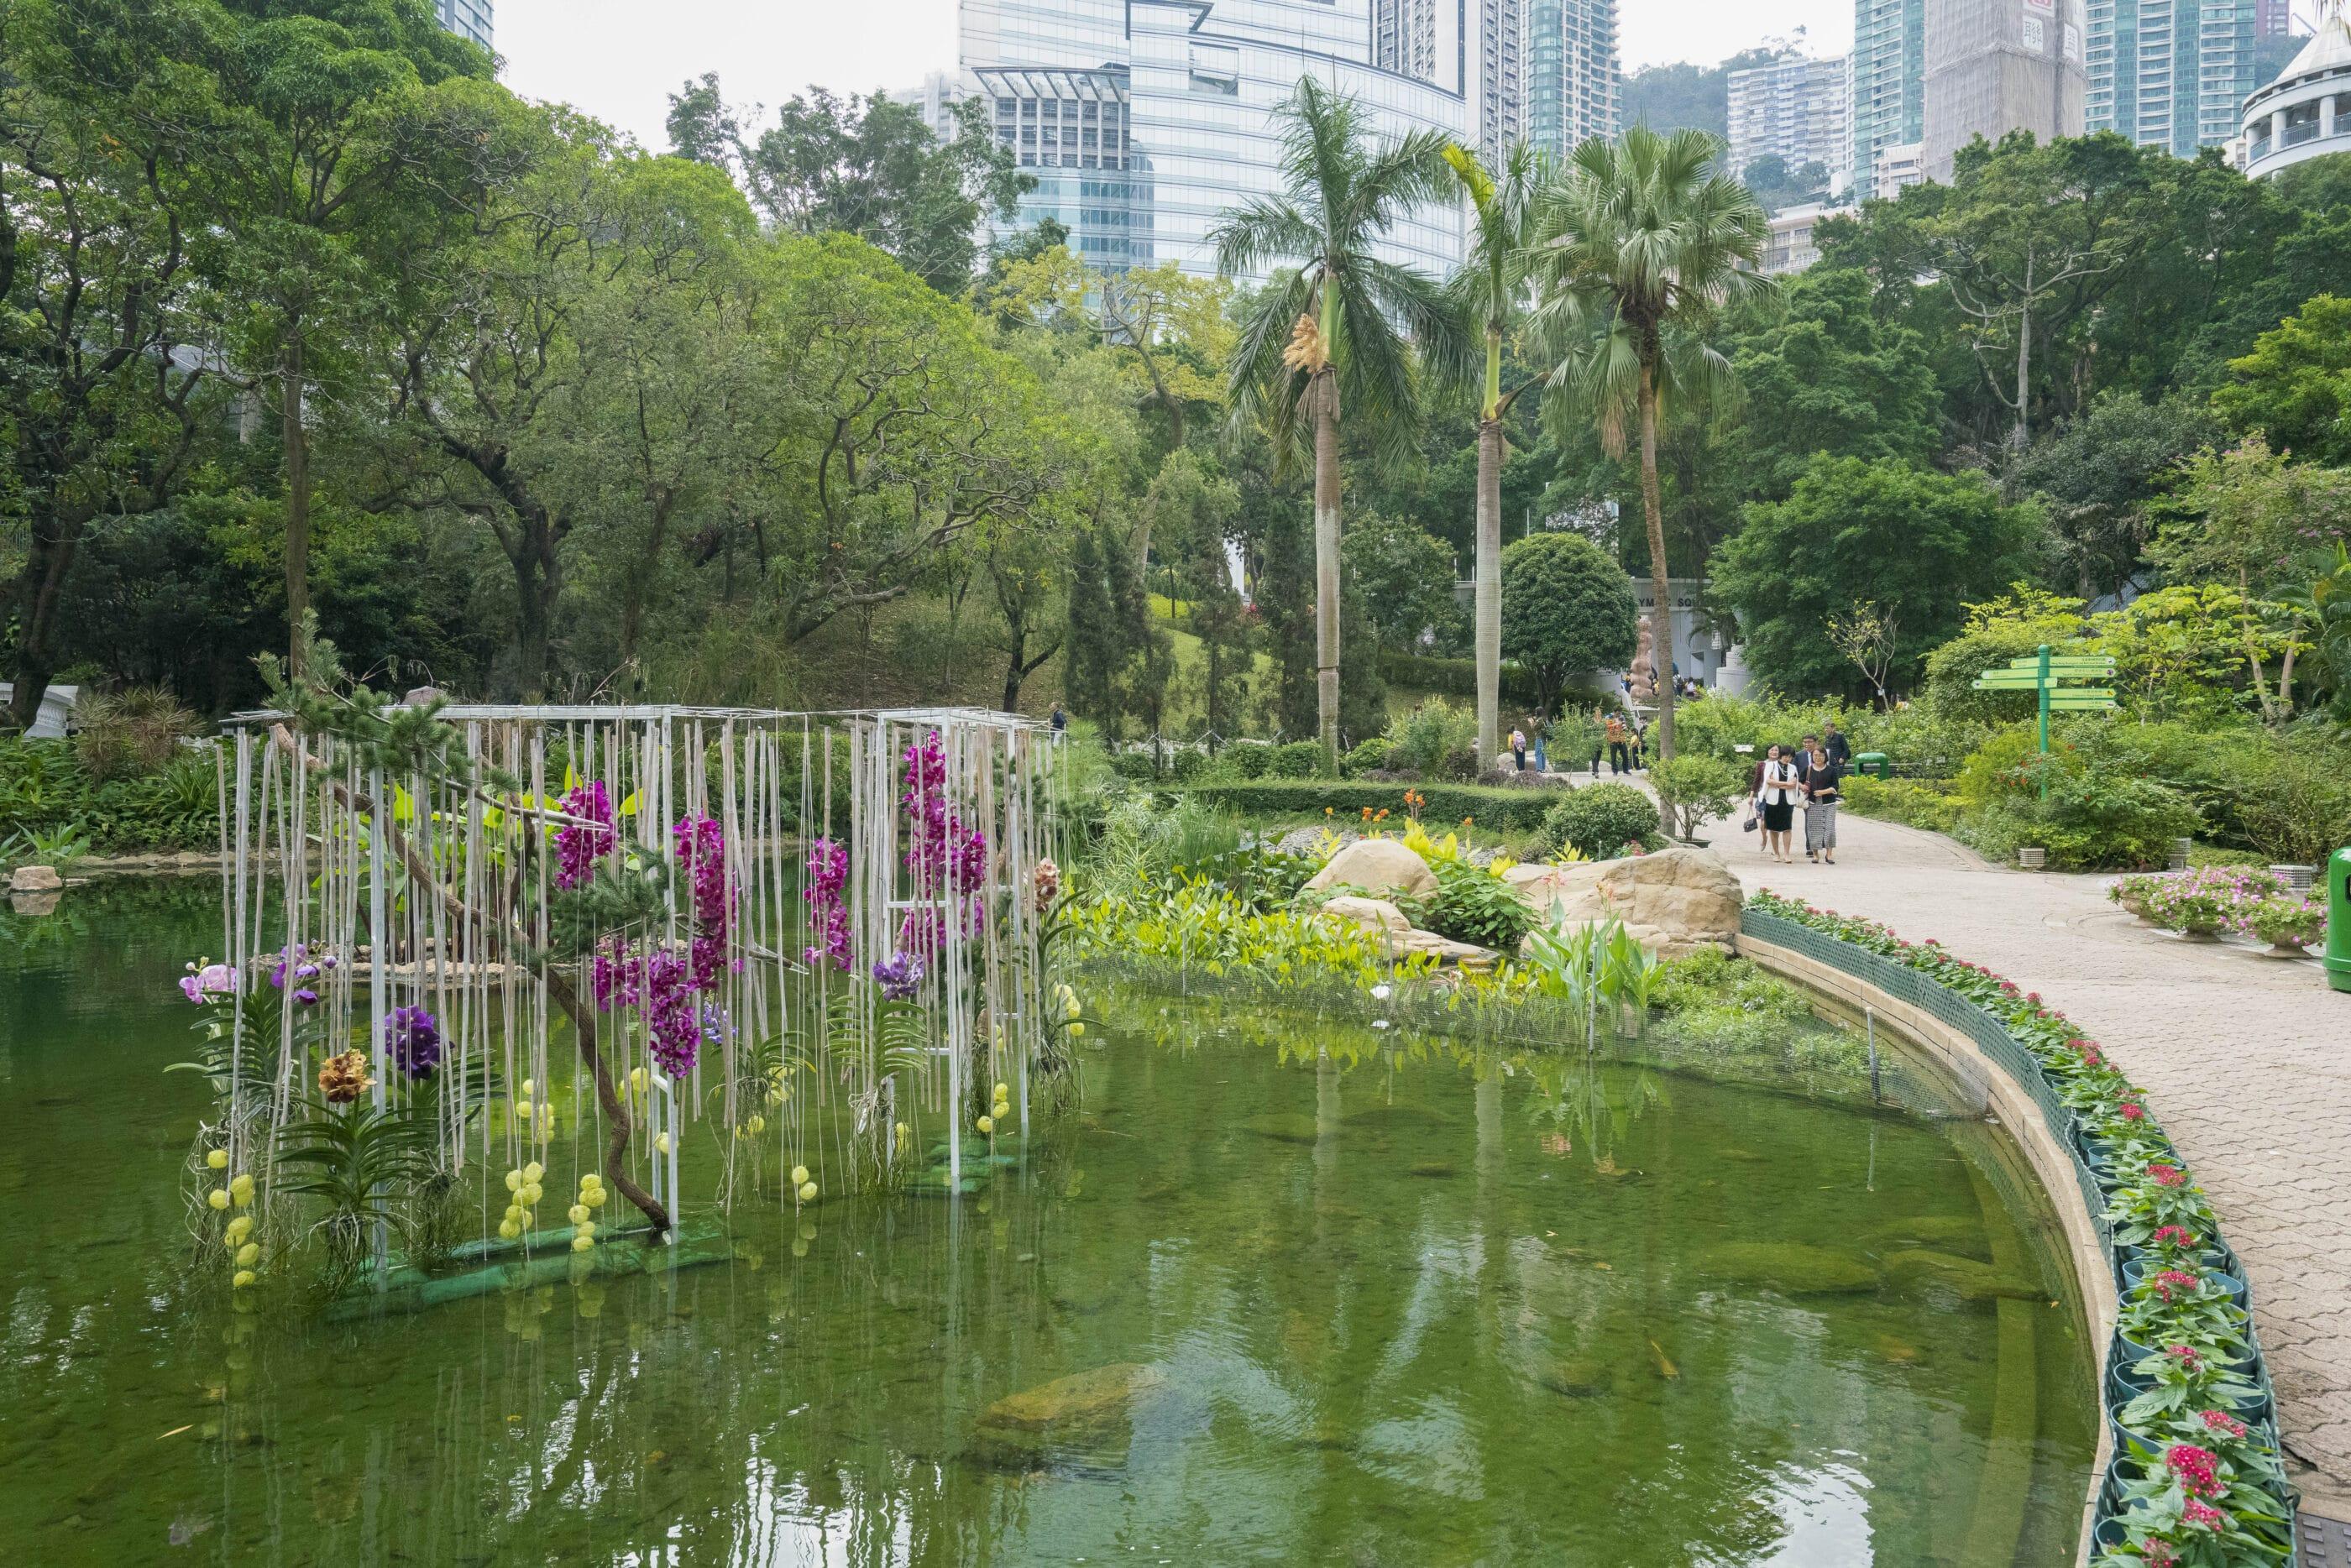 Orchids display in the Hong Kong Park lake.